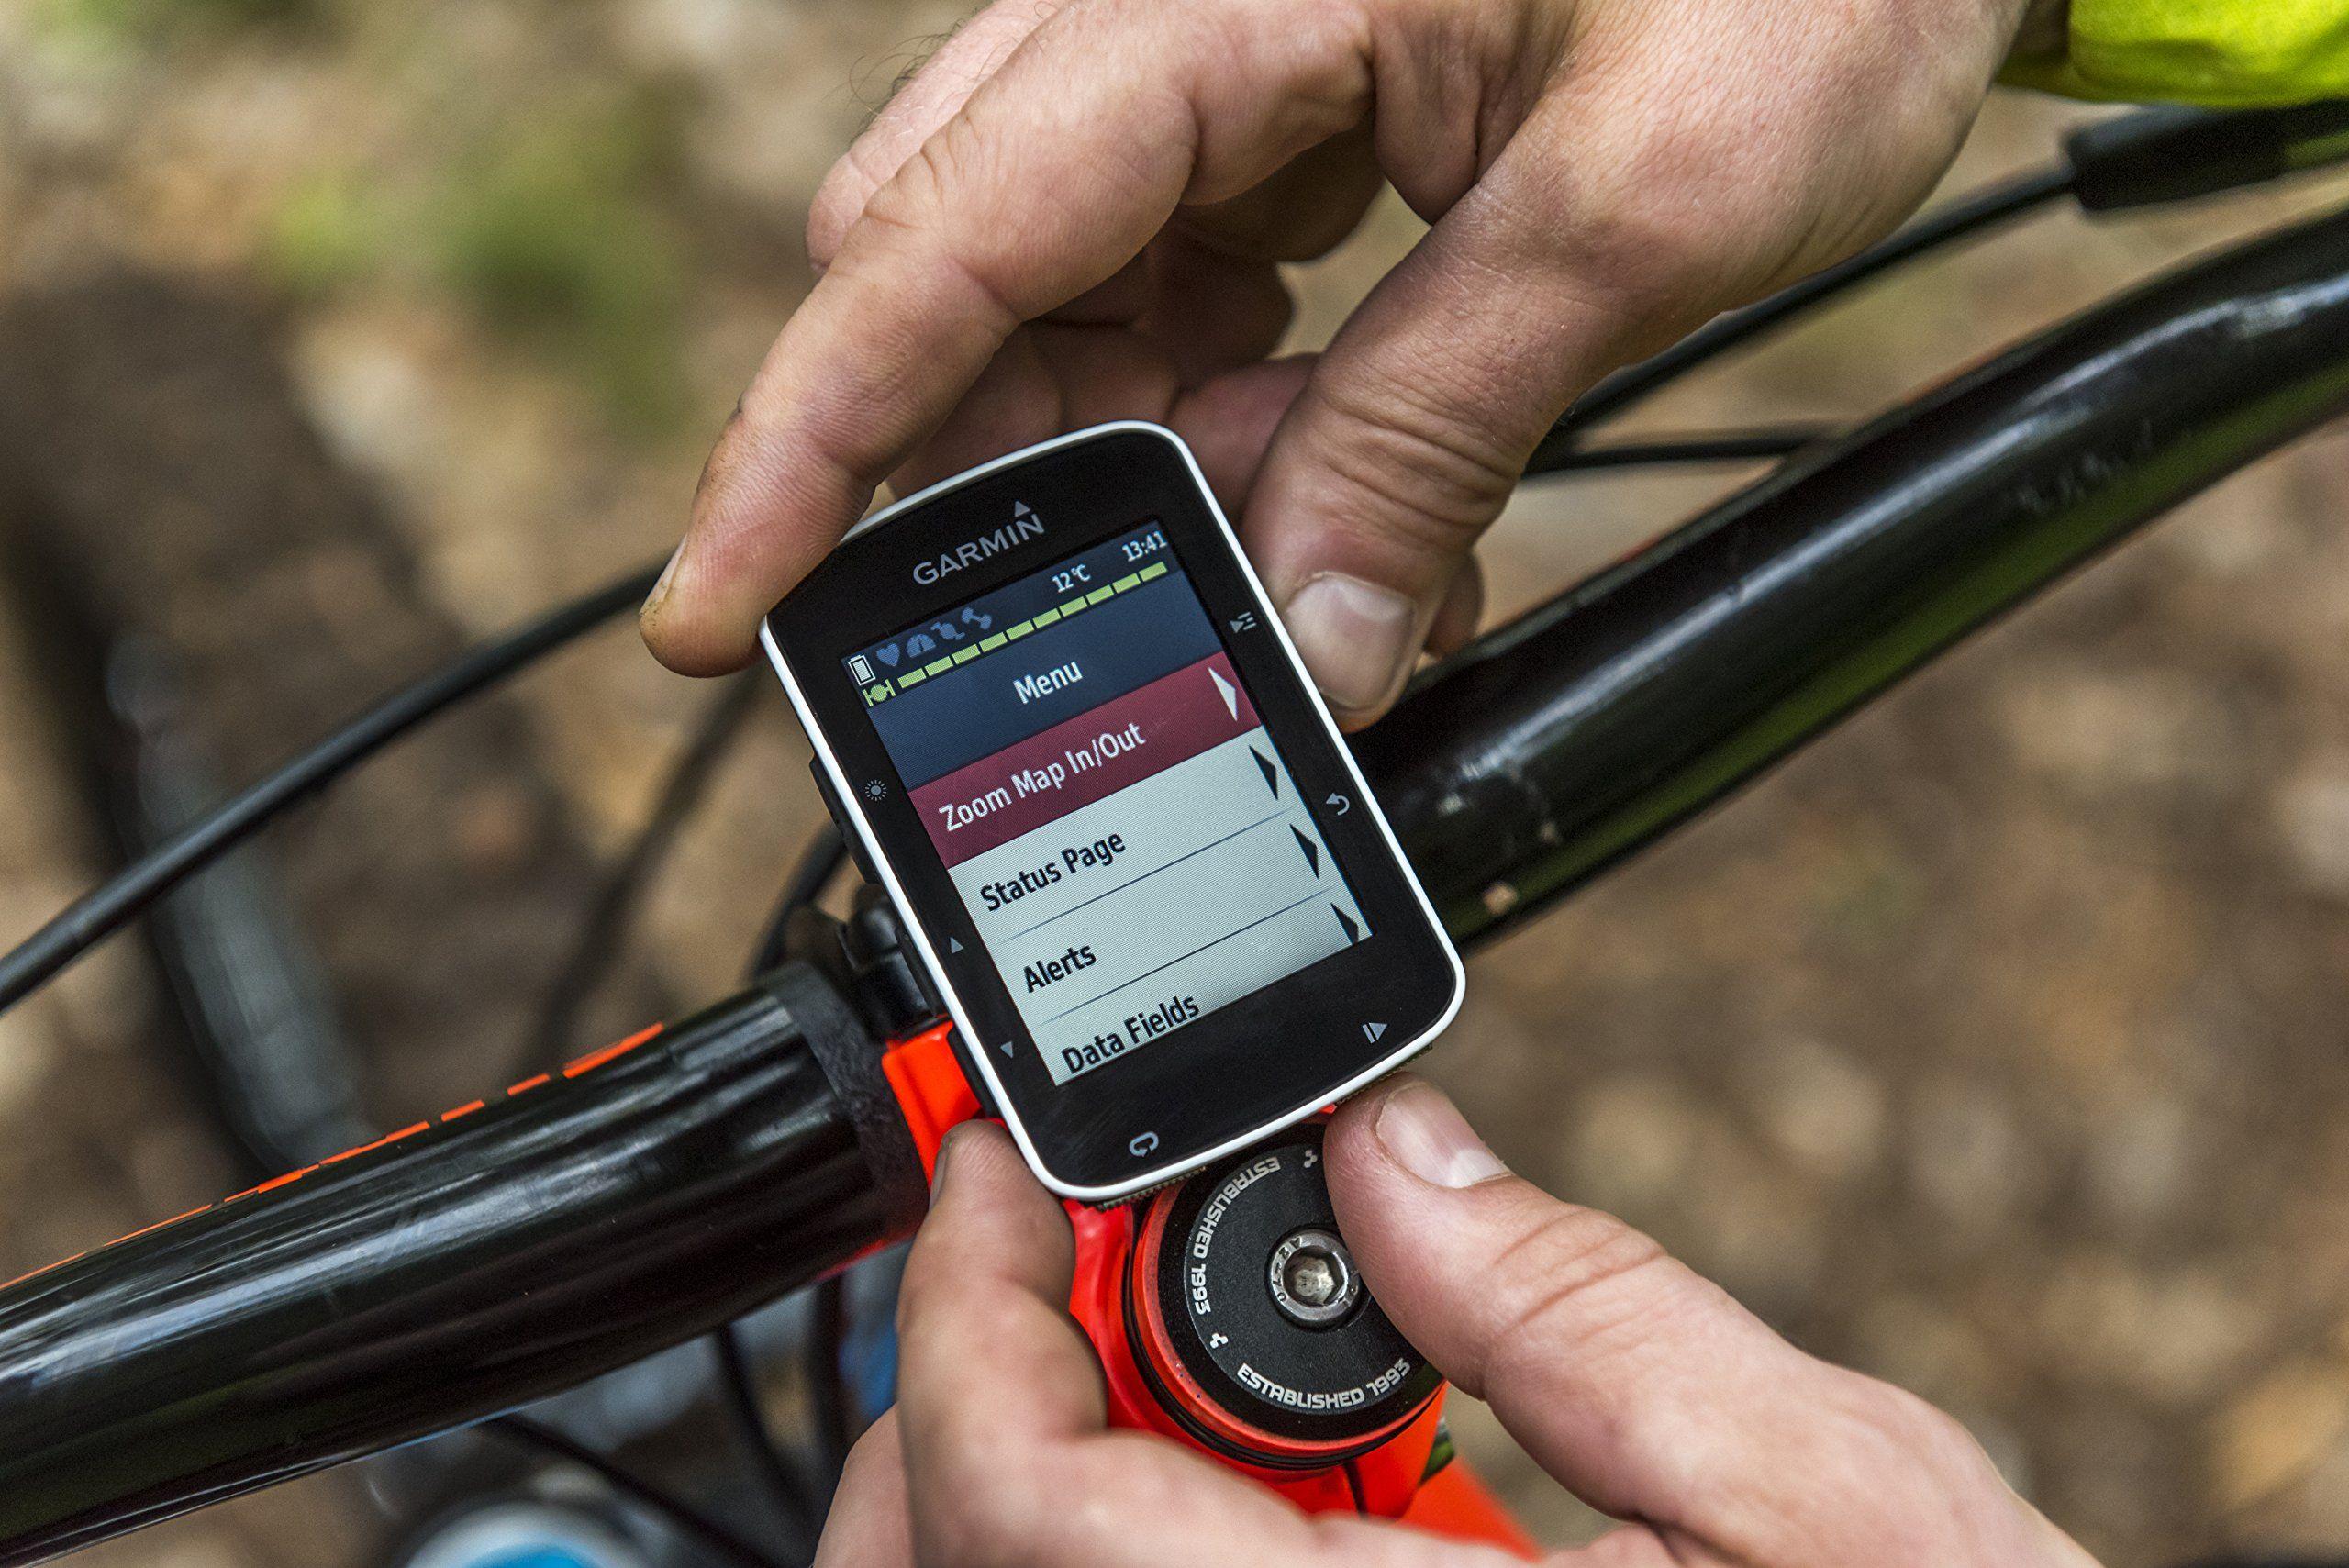 Garmin Edge 520 Bike Gps Includes Heart Rate Monitor Strap Cadence